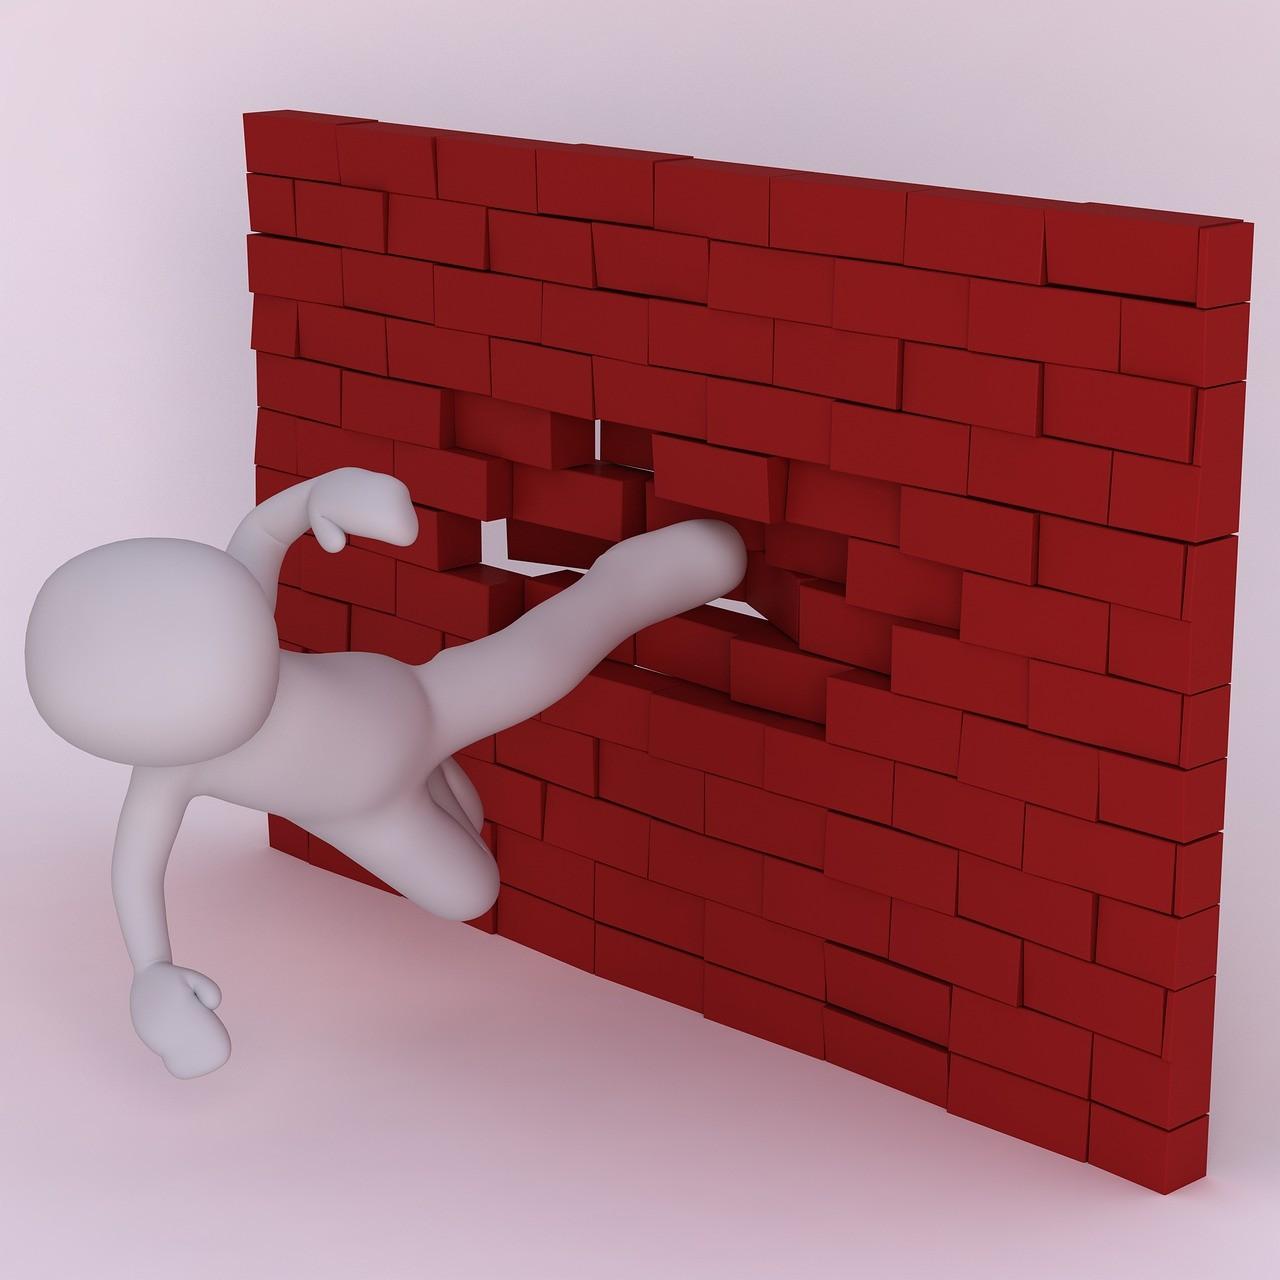 Wall Bricks Kick Angry Man D  - Peggy_Marco / Pixabay